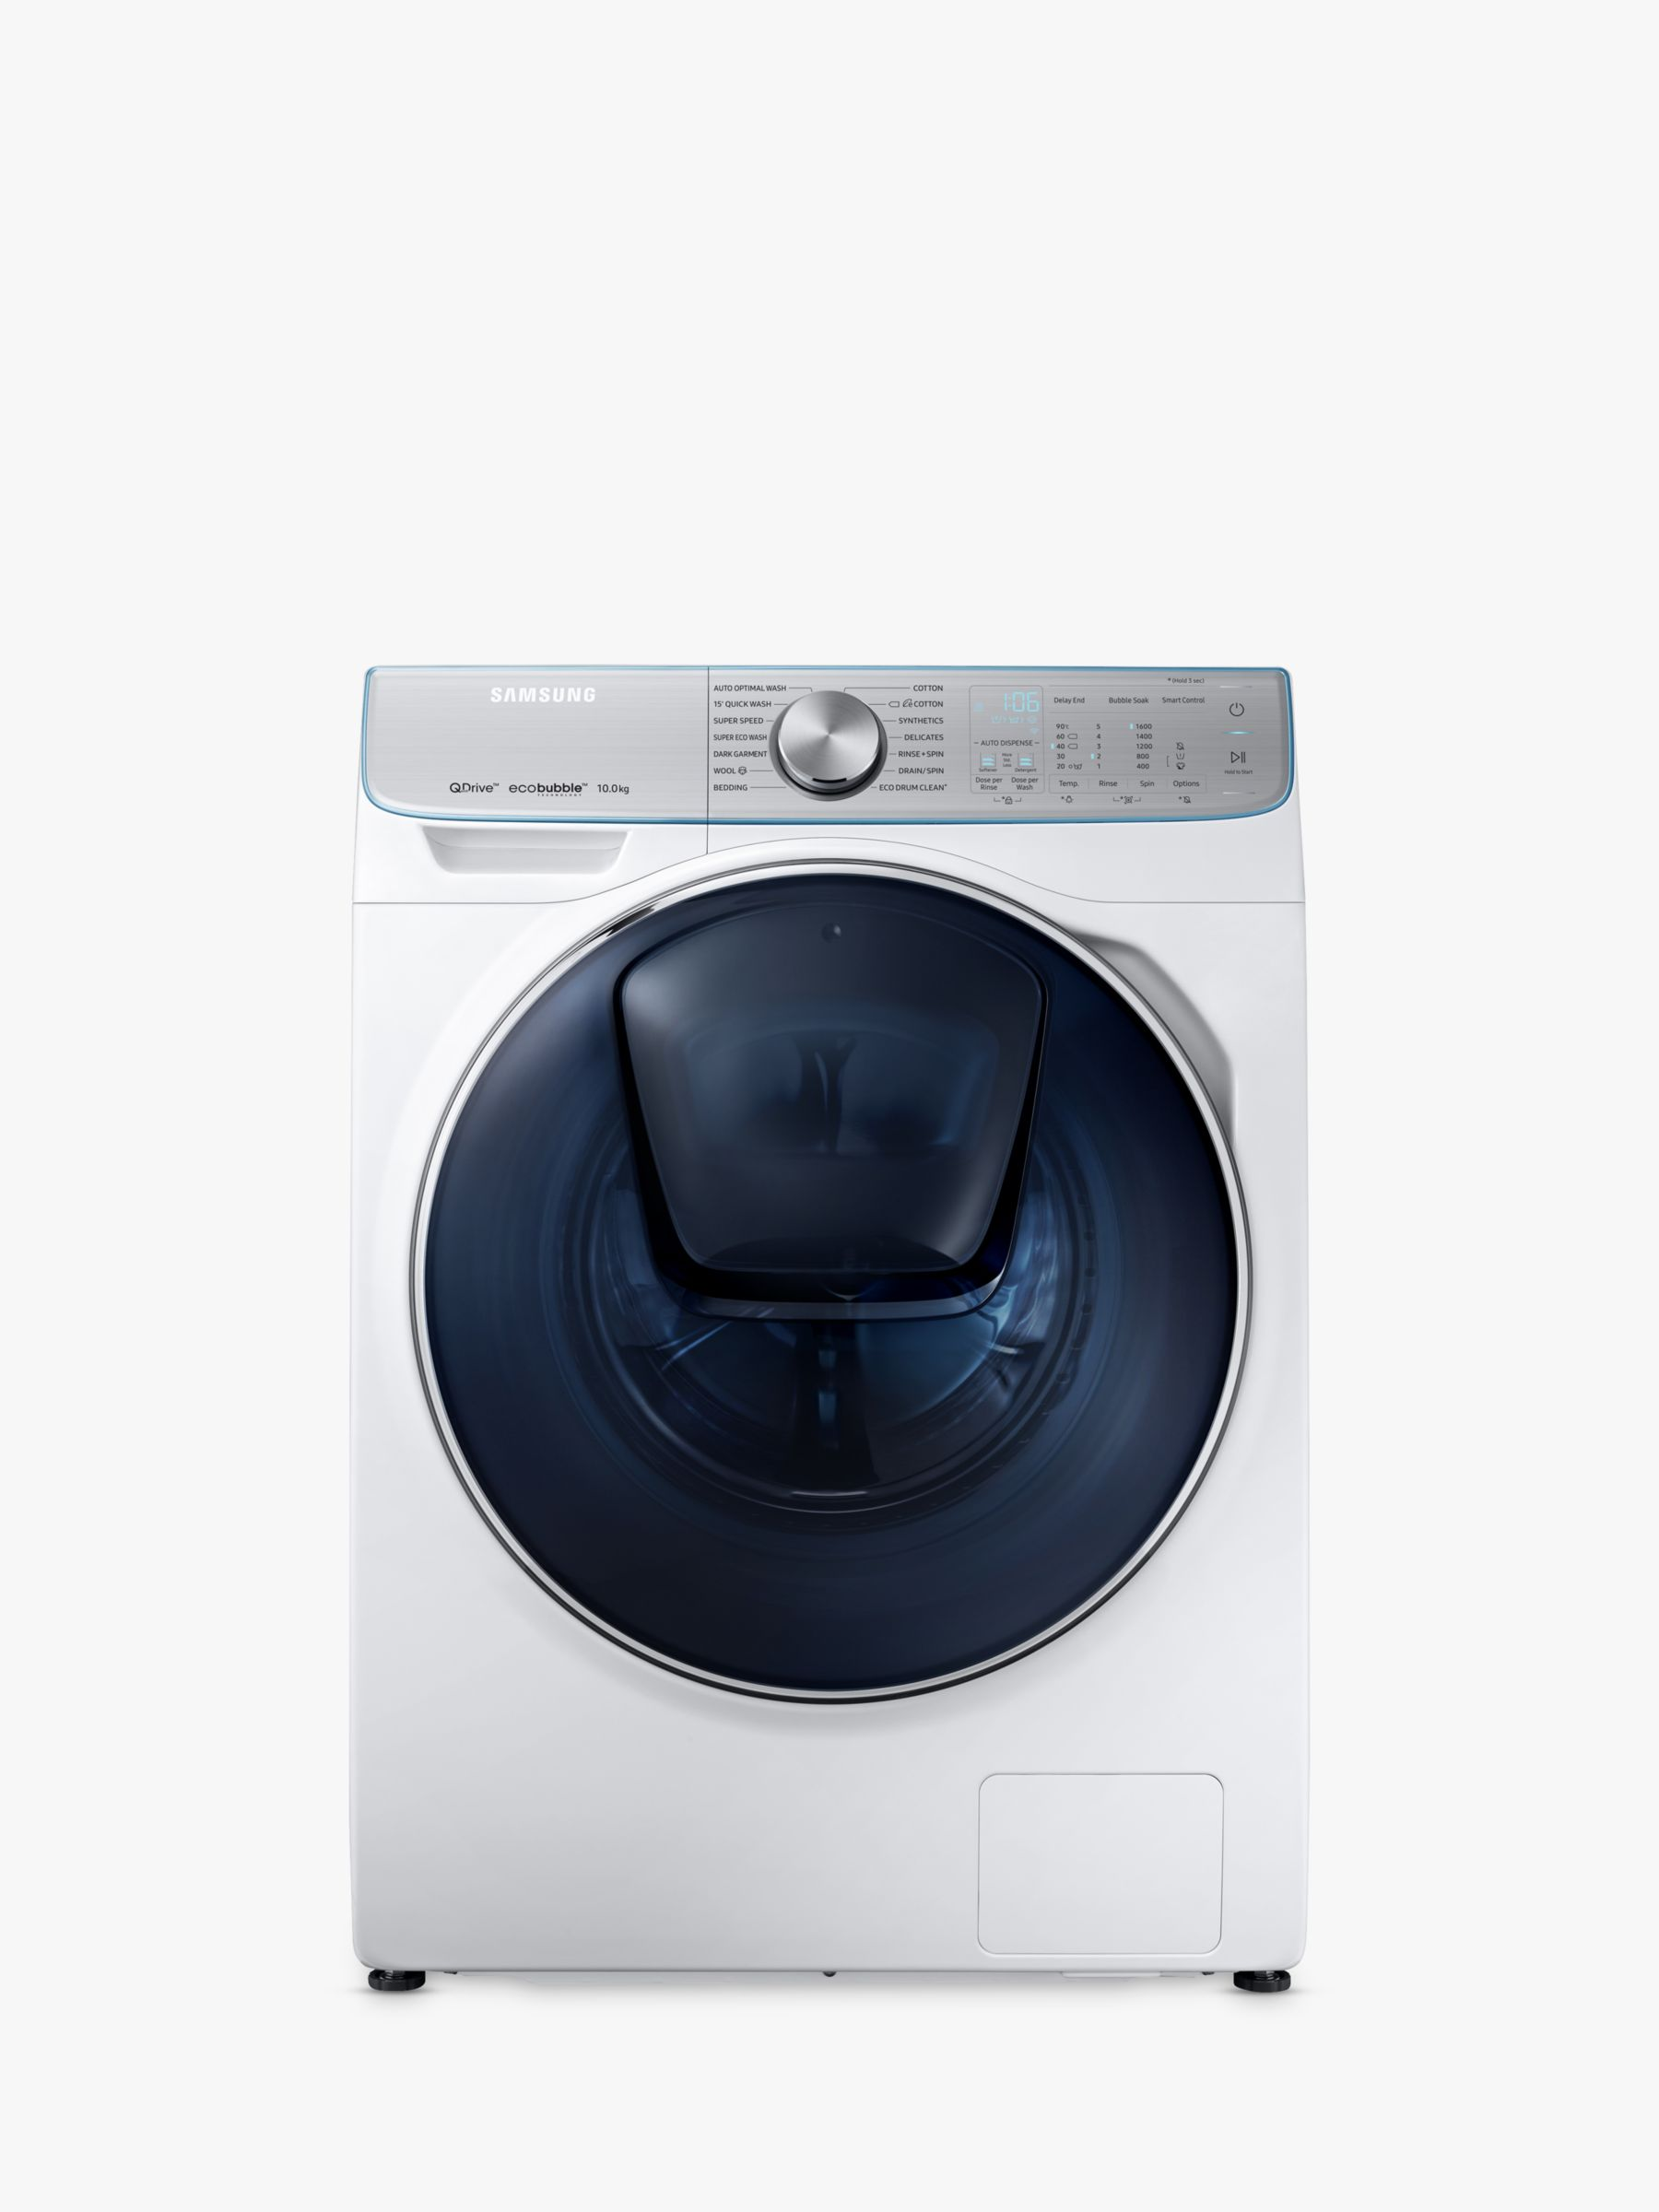 Samsung Samsung WW10M86DQOA/EU Freestanding QuickDrive Washing Machine, 10kg Load, A+++ Energy Rating, 1600rpm Spin, White